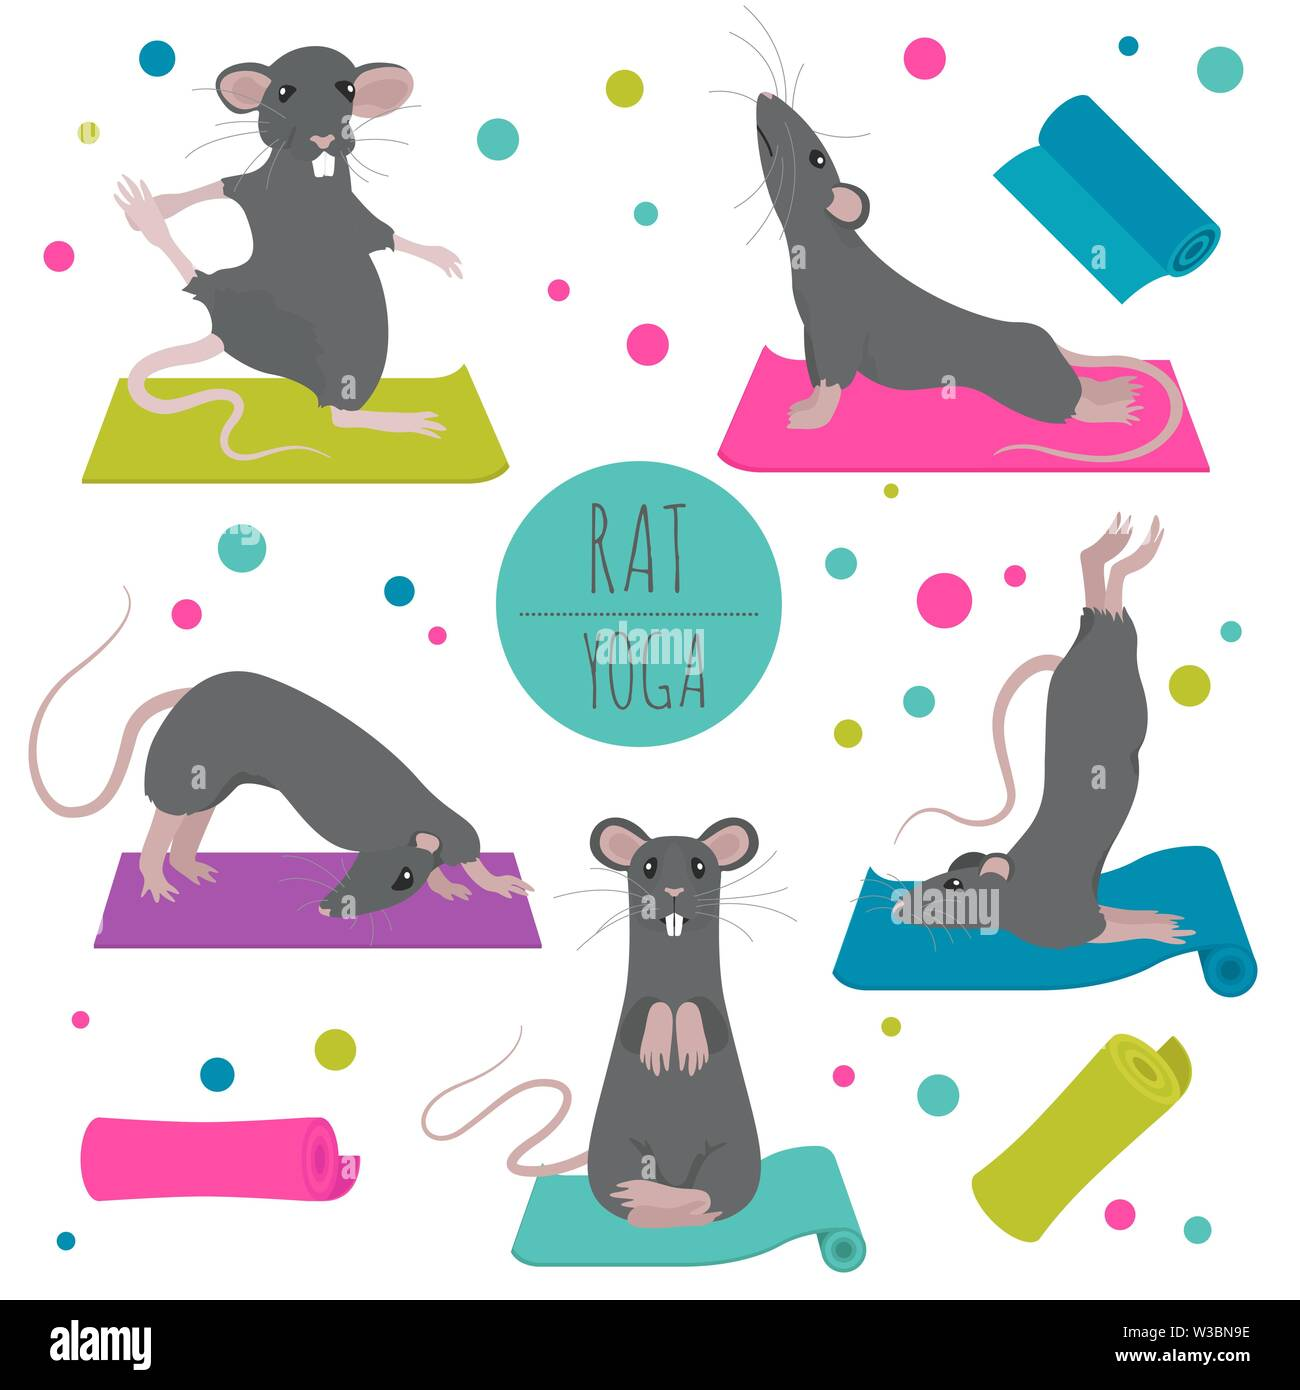 Rat Yoga Poses And Exercises Cute Cartoon Clipart Set Vector Illustration Stock Vector Image Art Alamy